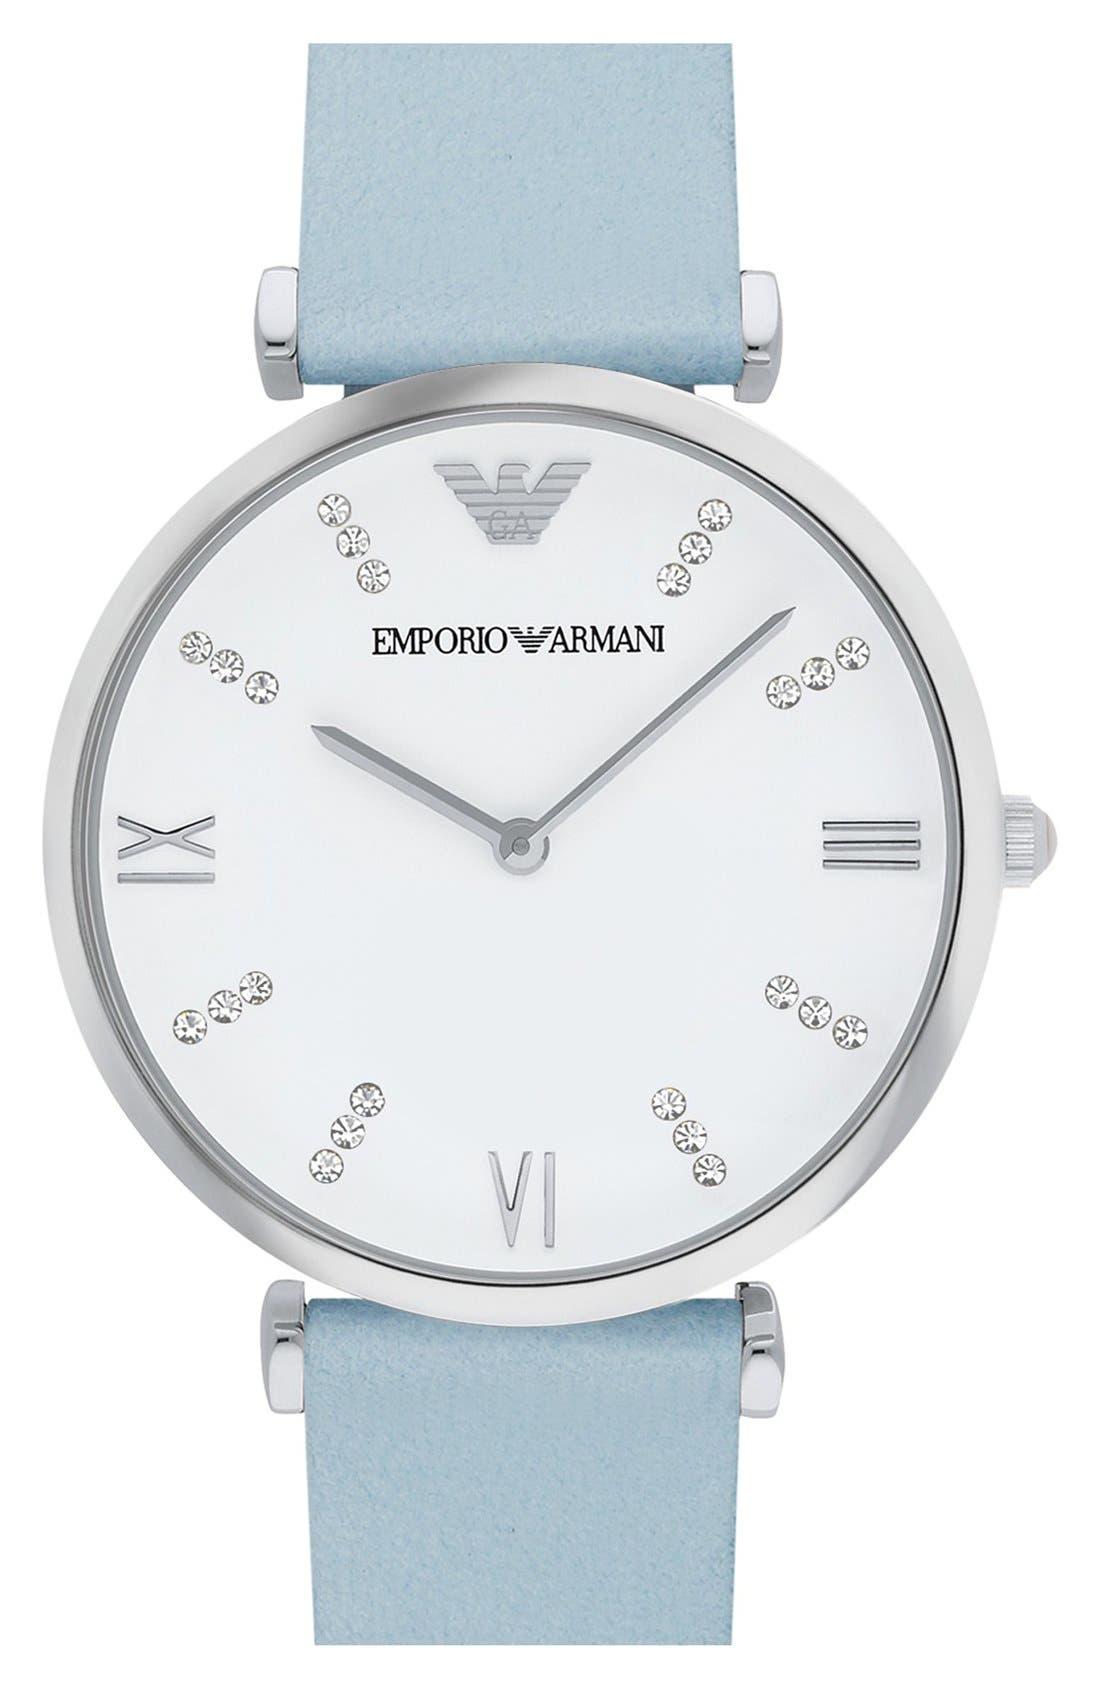 Alternate Image 1 Selected - EmporioArmani 'Retro' Leather Strap Watch, 32mm